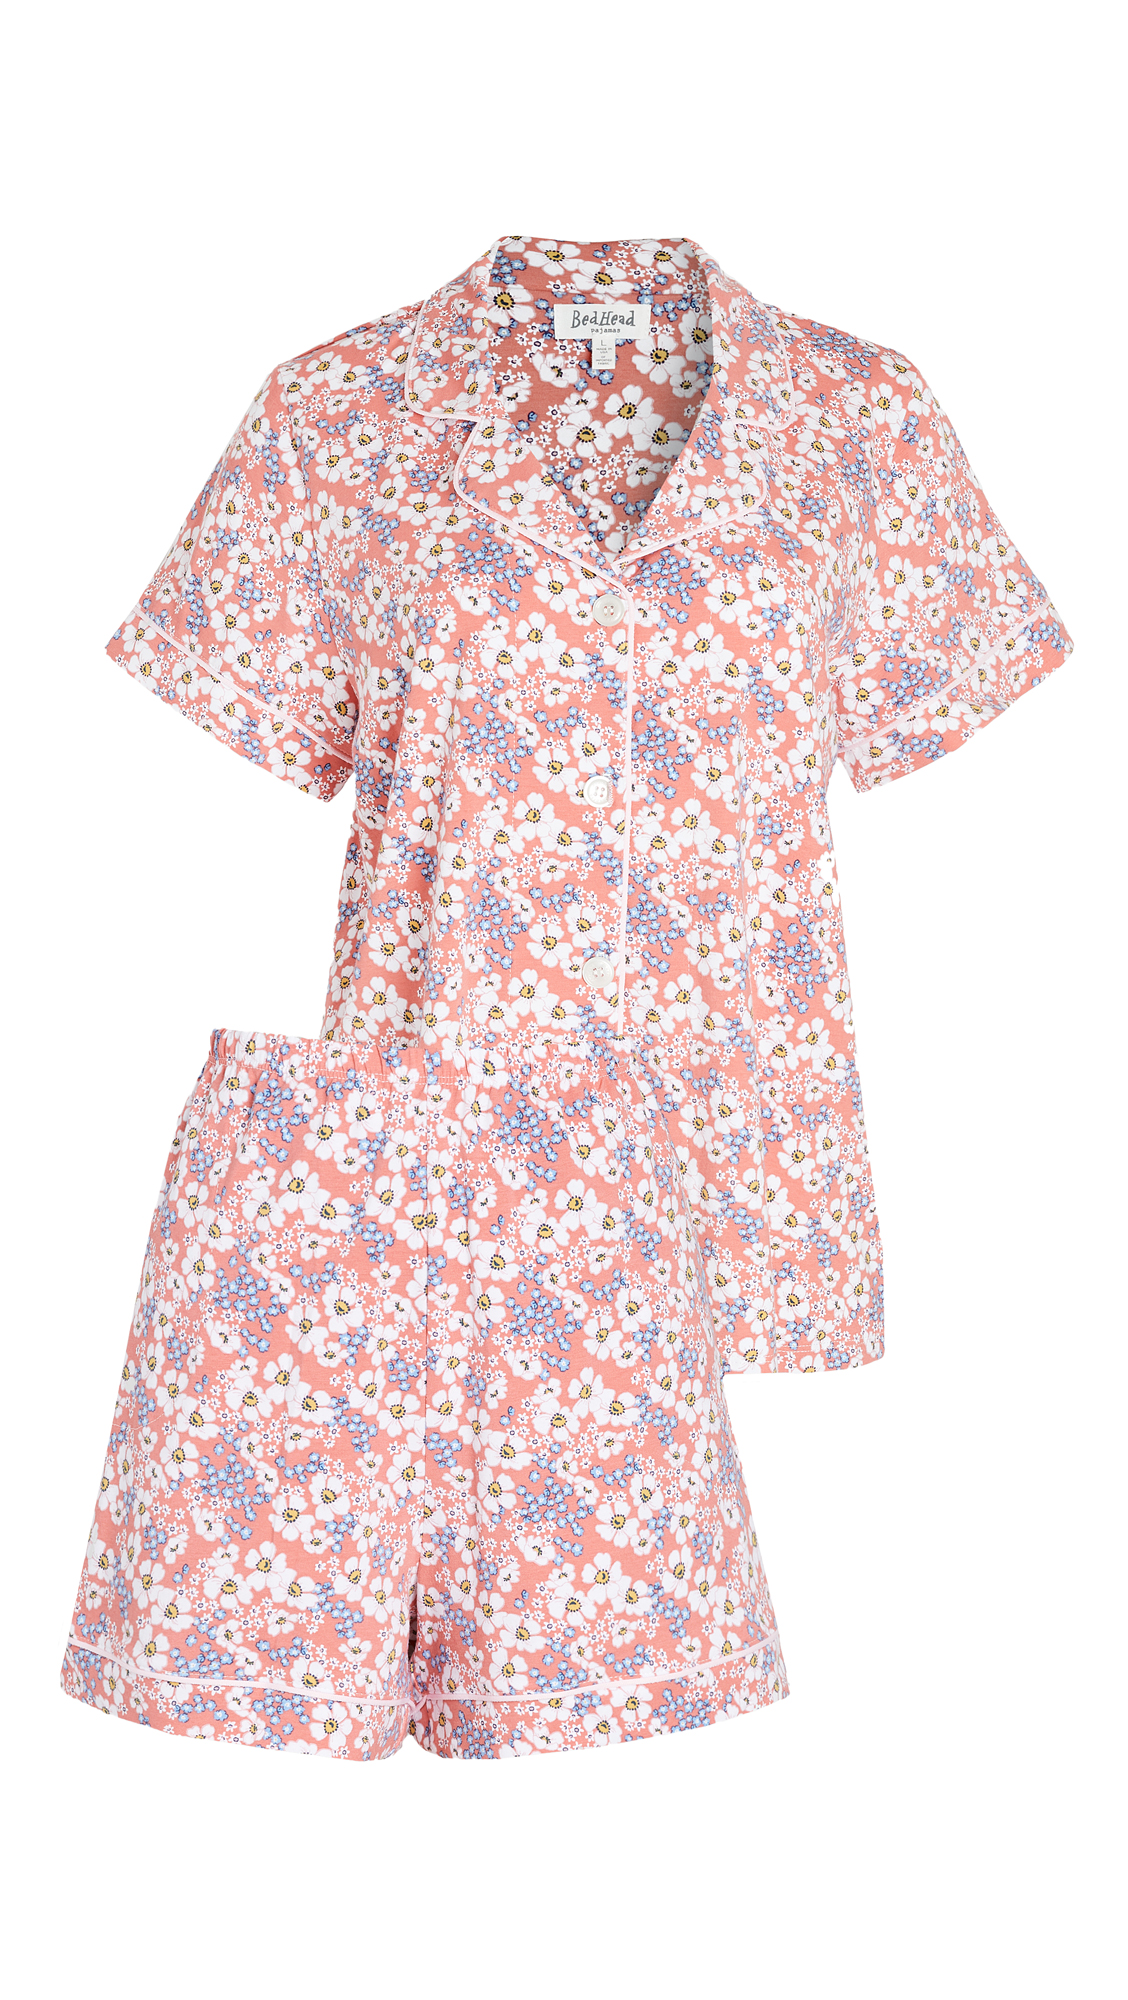 BedHead Pajamas Meadows Short Sleeve Classic Shorty PJ Set